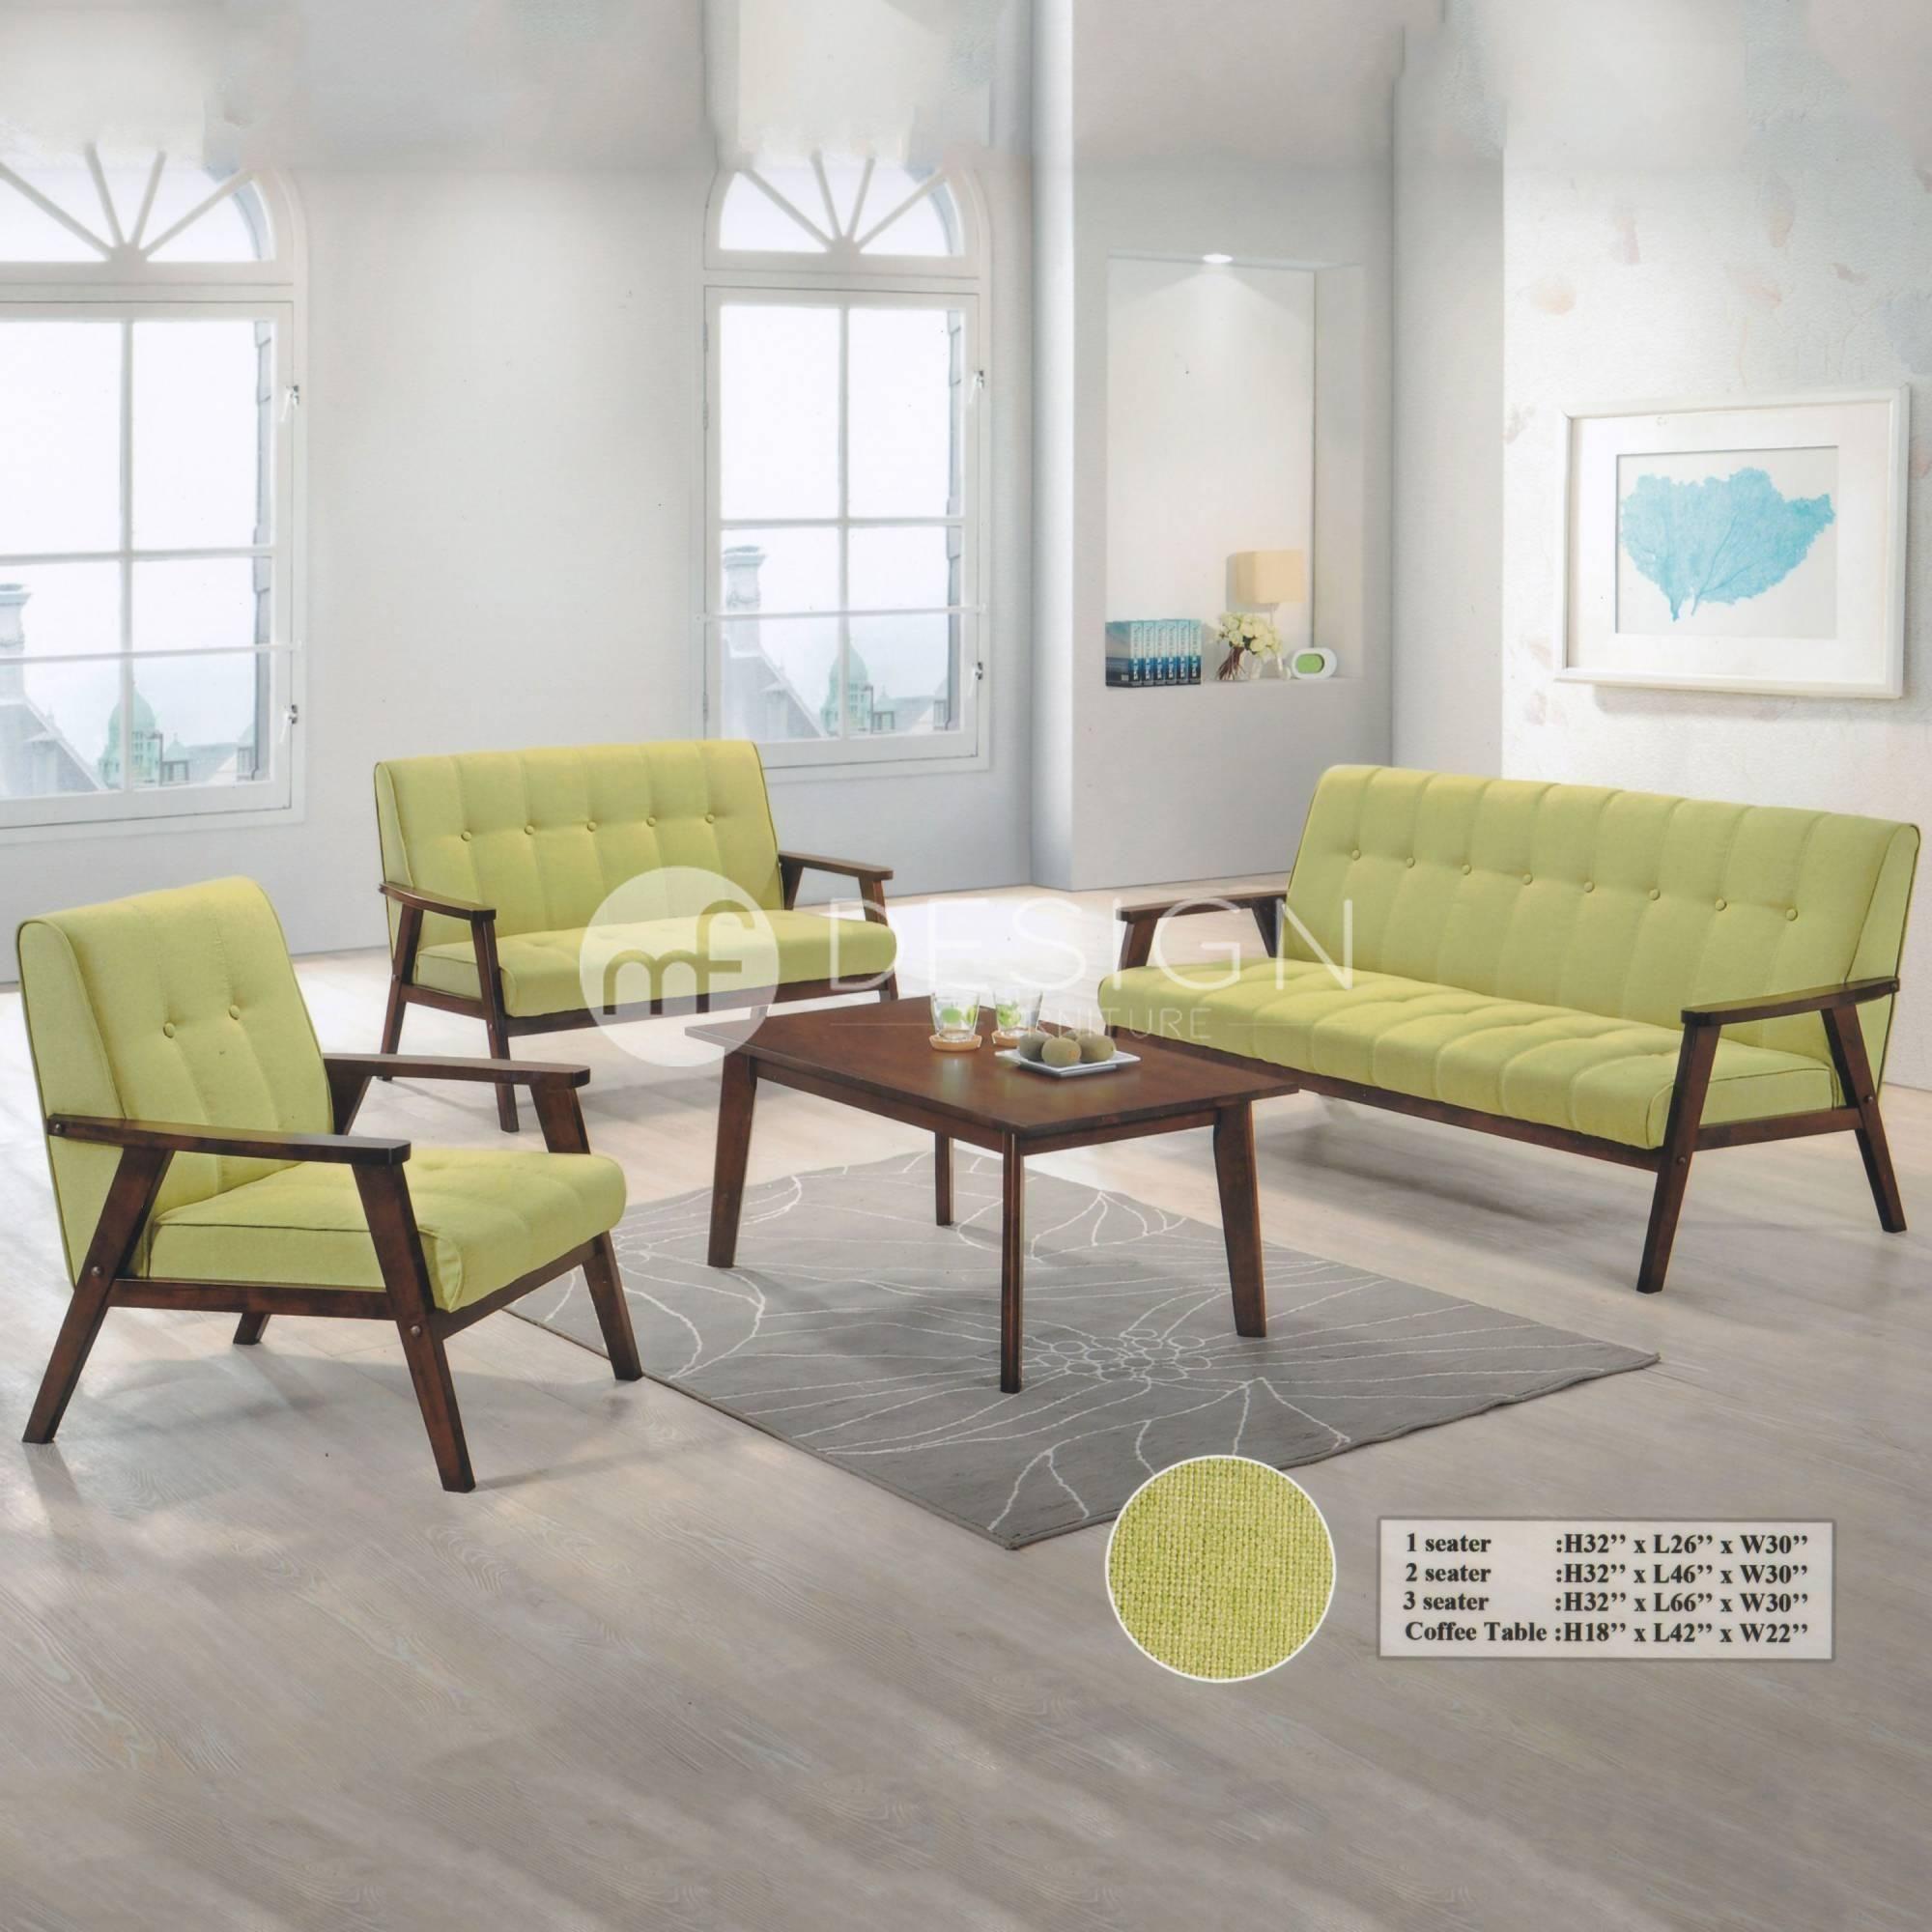 Furniture Design Malaysia nordic 1+2+3+table antique sofa set (green) | mf design